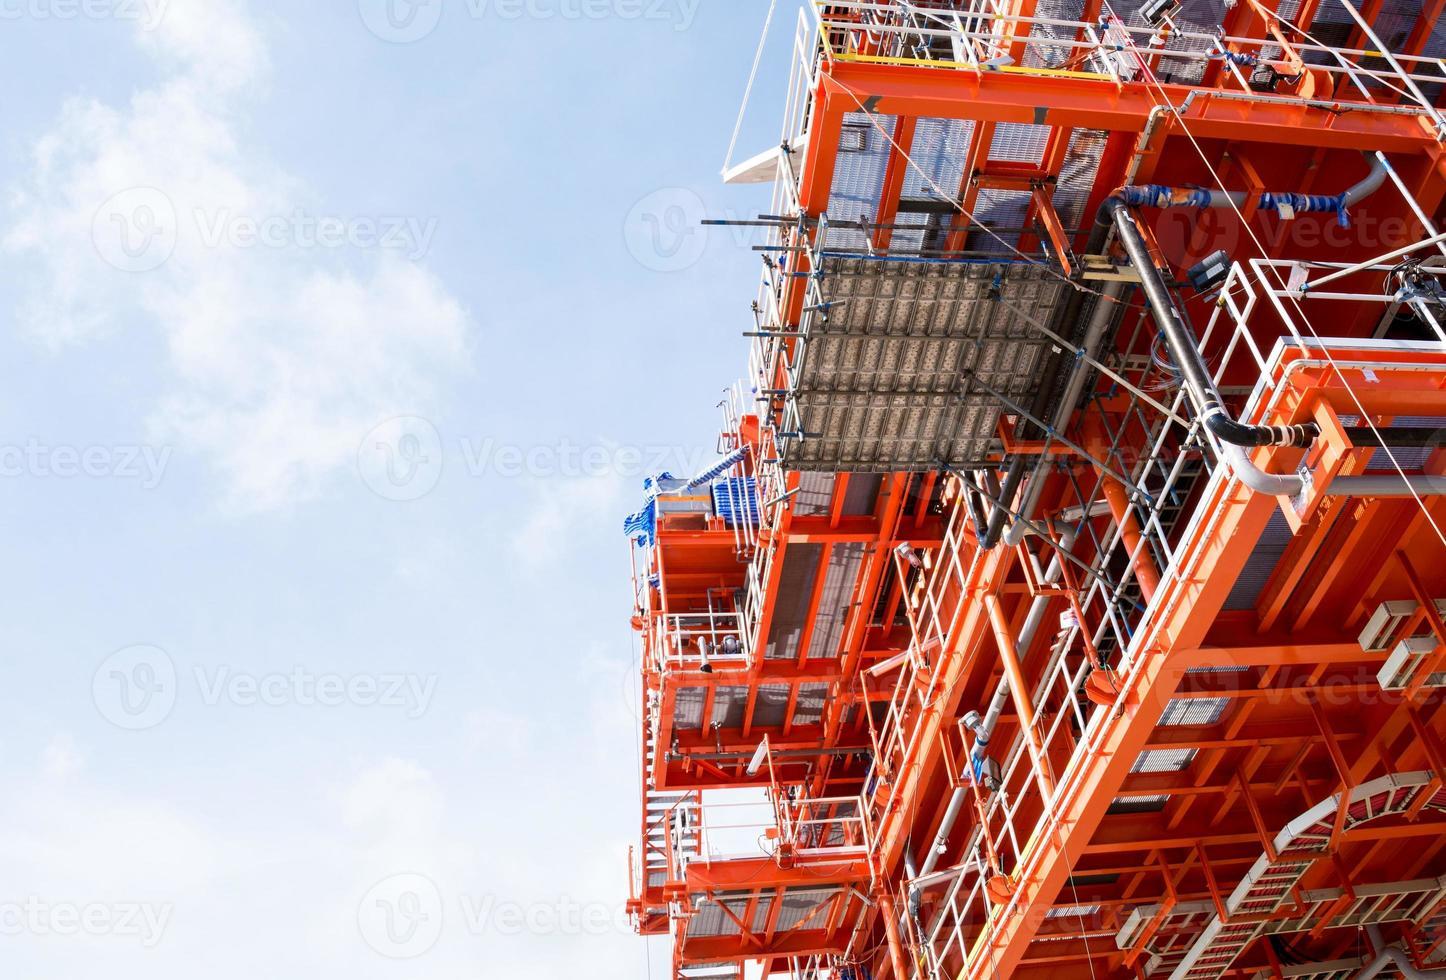 Öl- und Gasförderplattform foto